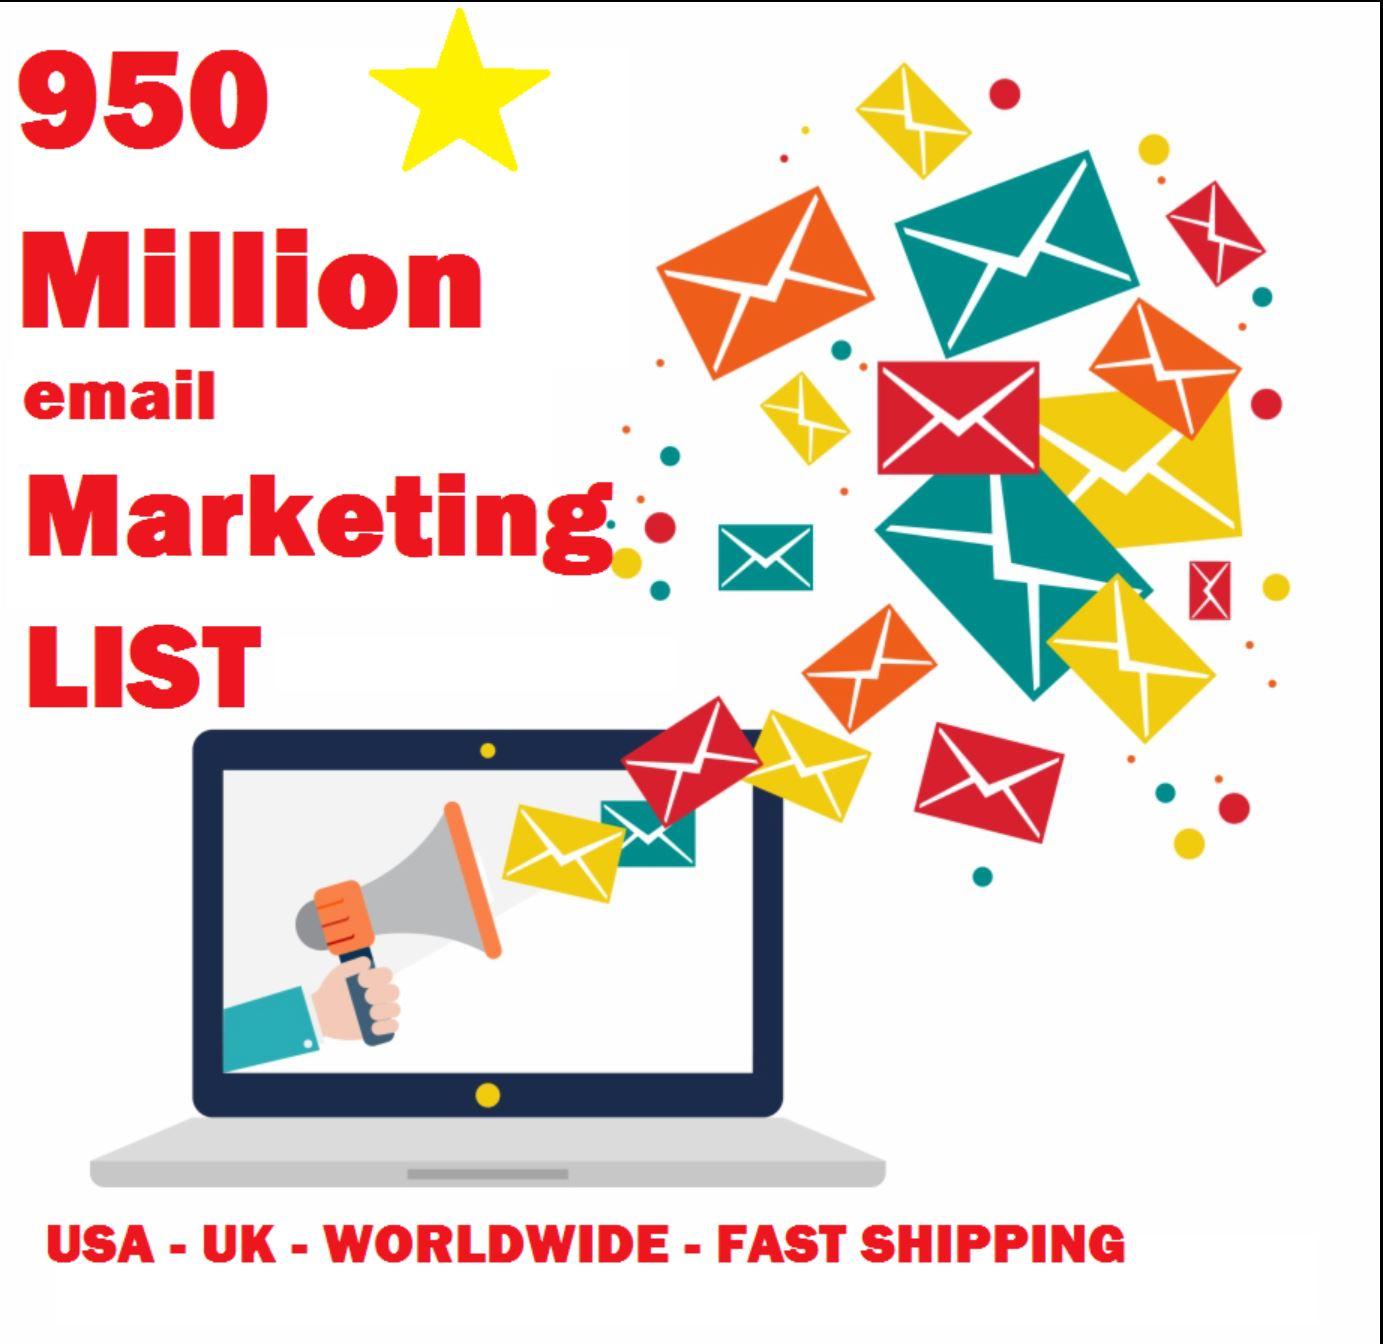 Skyrocket your Marketing with 950 Million Emails + Bonus